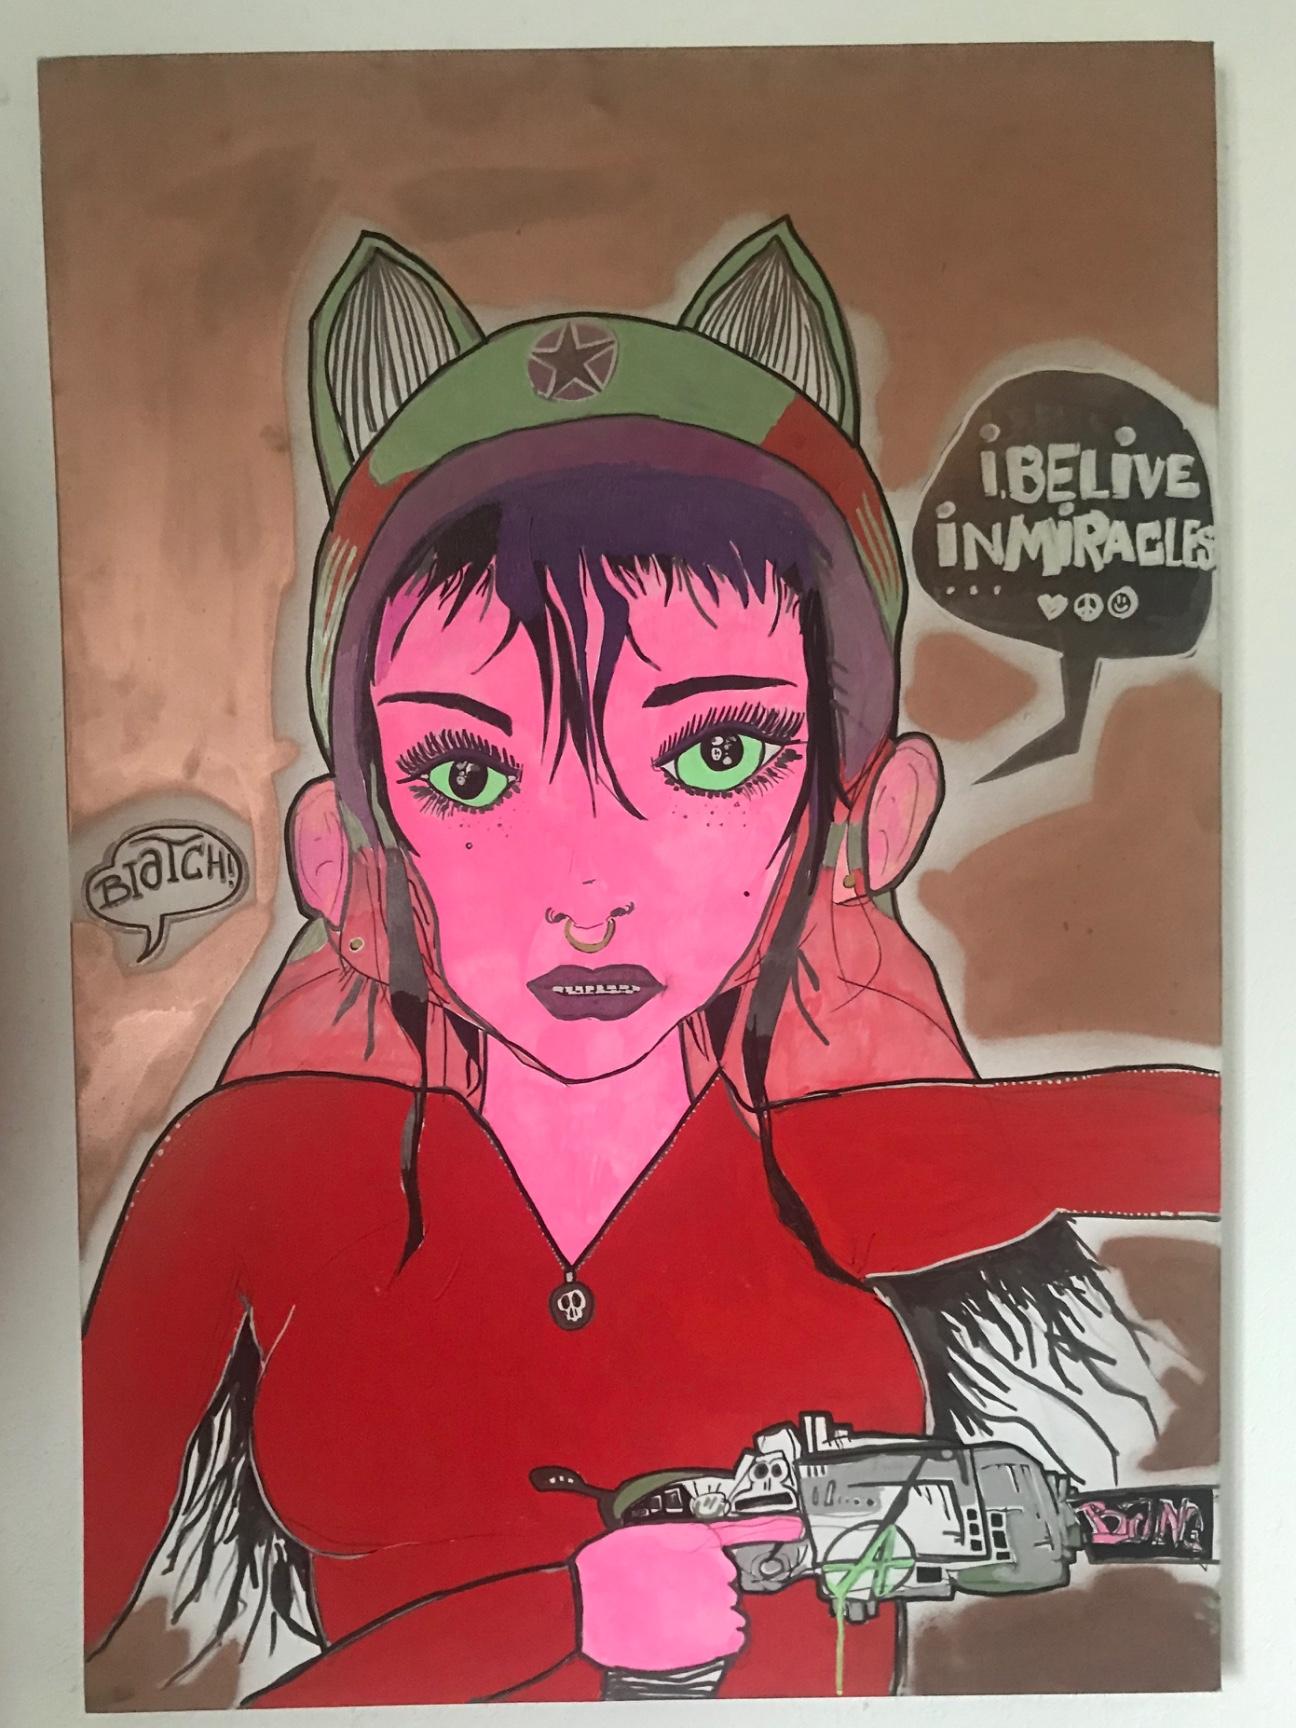 artigall: neue Kunstwerke Tankgirl skywalker